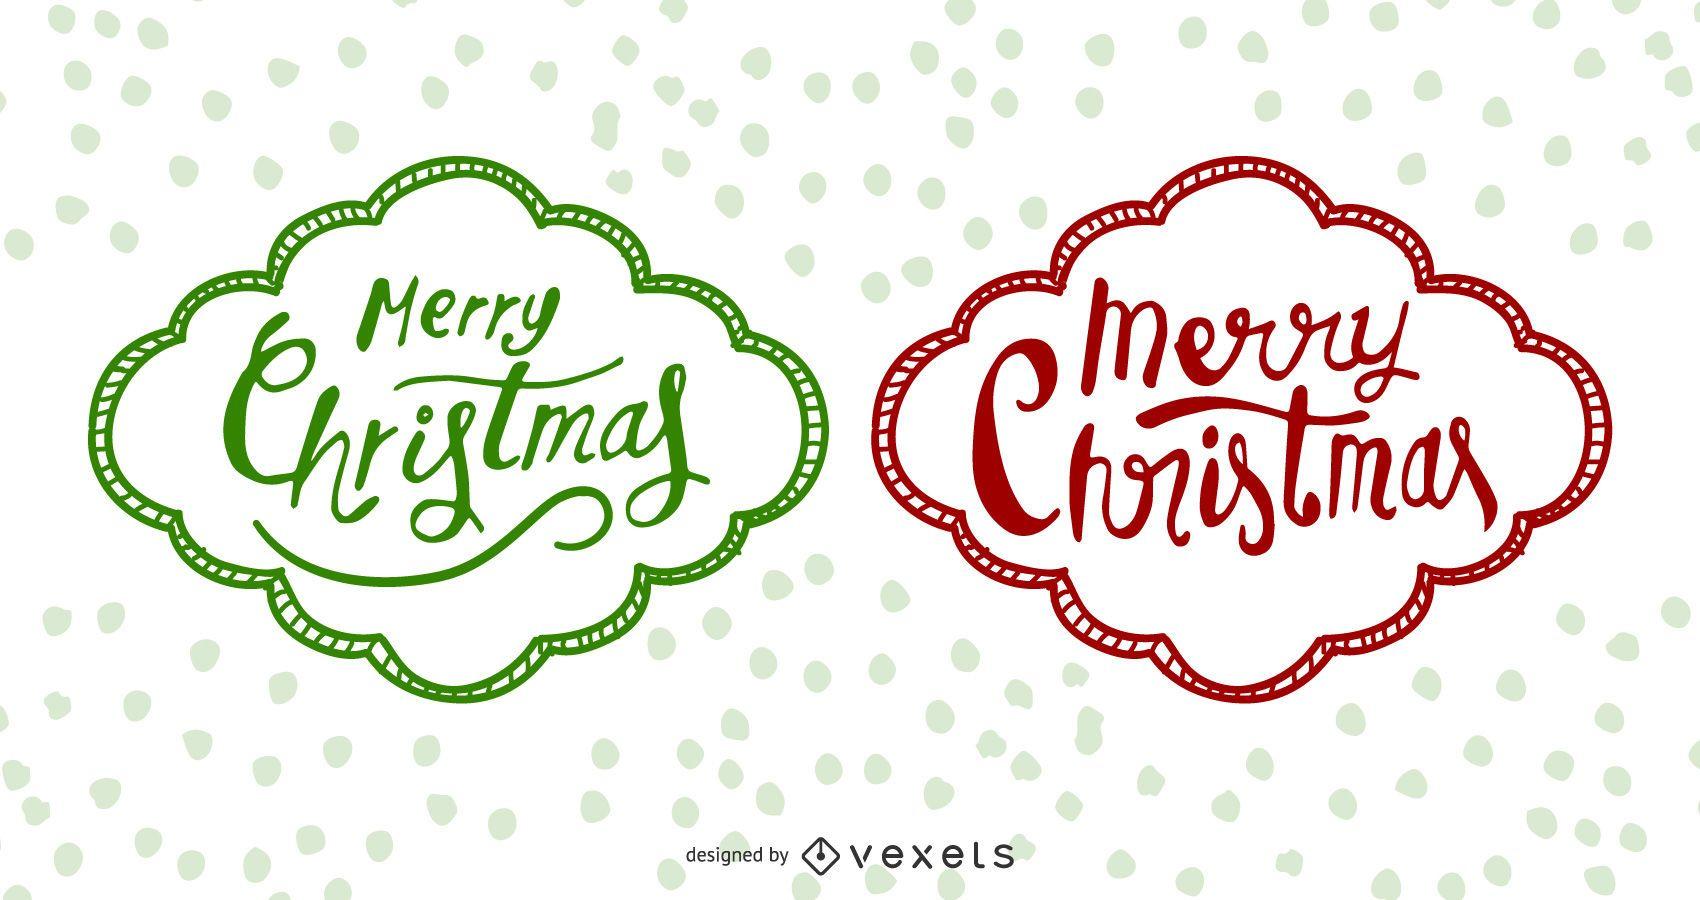 Etiquetas navideñas dibujadas a mano funky